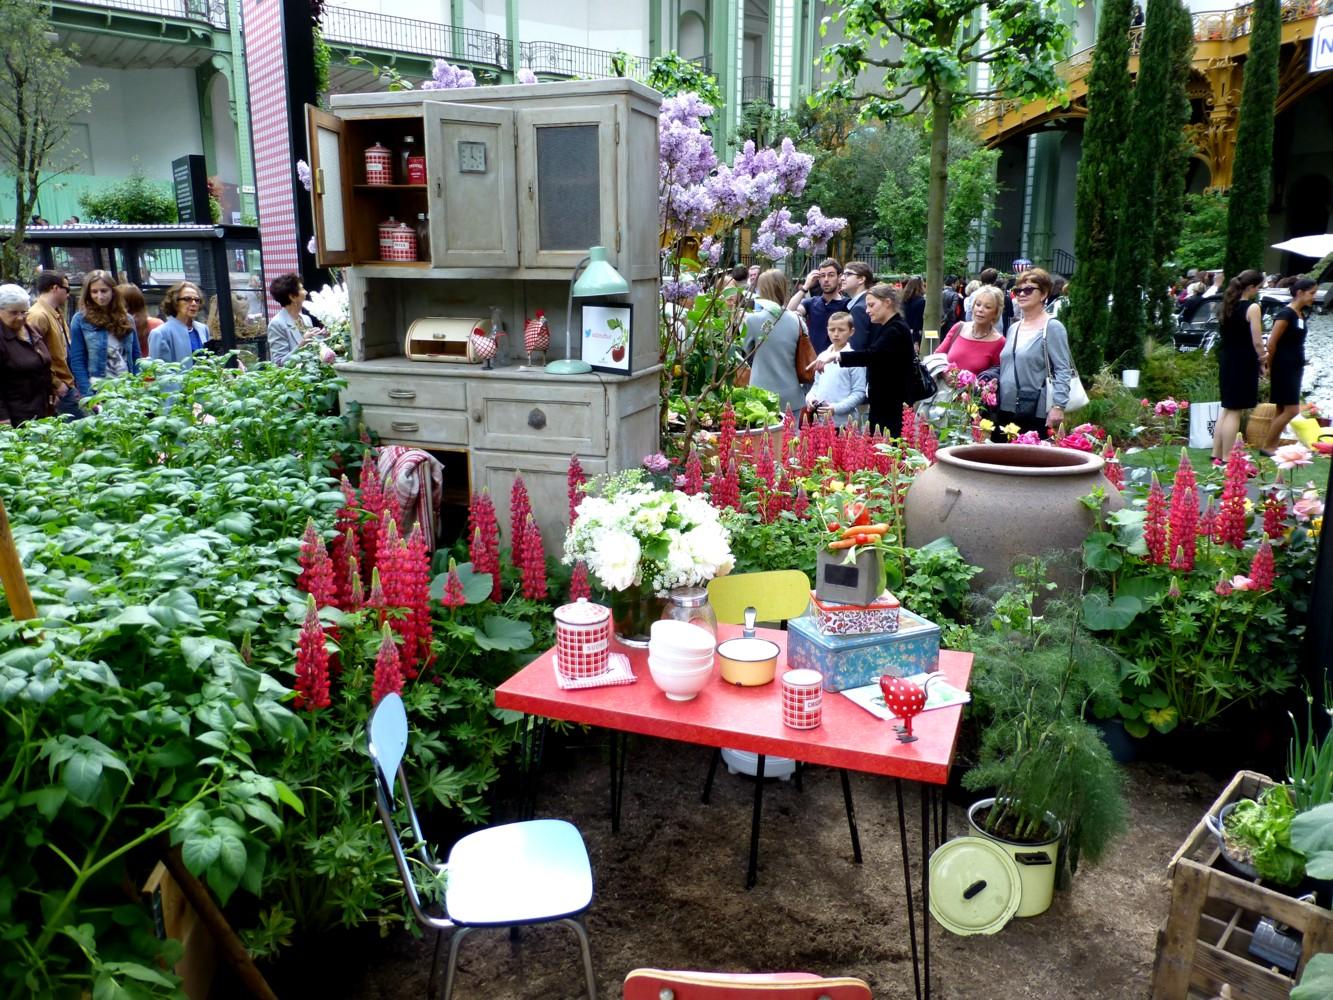 Cuisine champ tre by truffaut l 39 art du jardin nef grand for Art du jardin zbinden sa